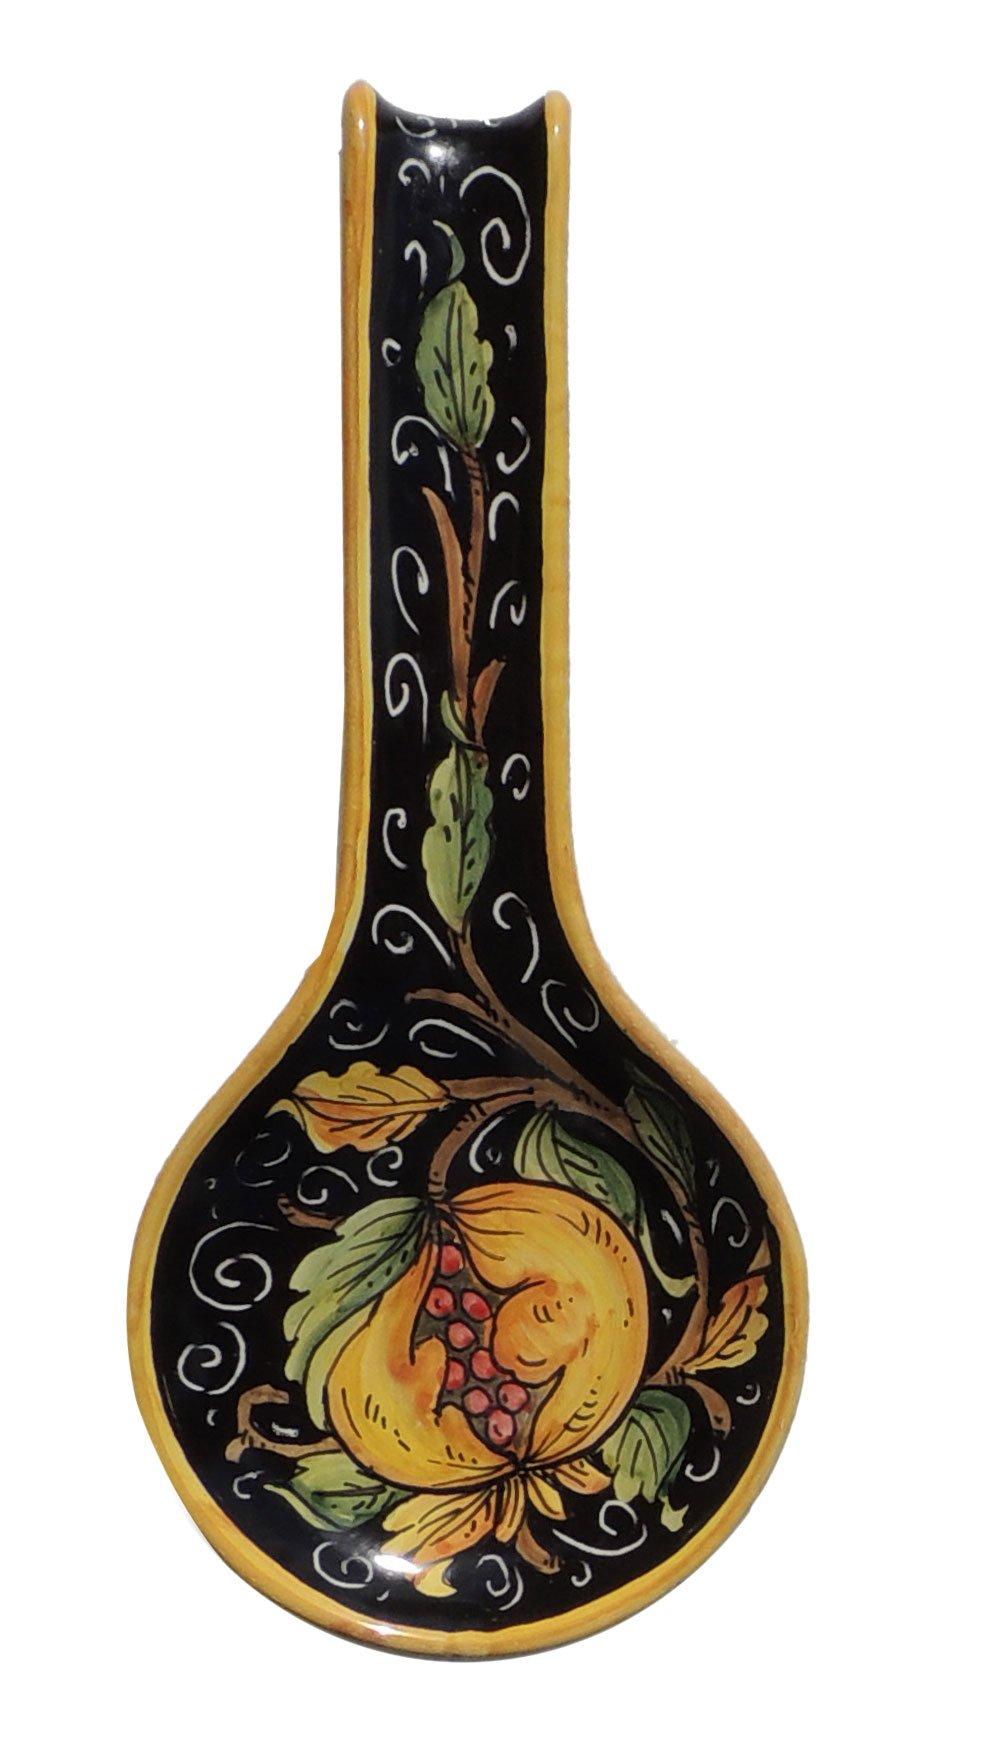 Italian Ceramic Spoonrest - Fig - Bottega degli Artisti by Bottega degli Artisti